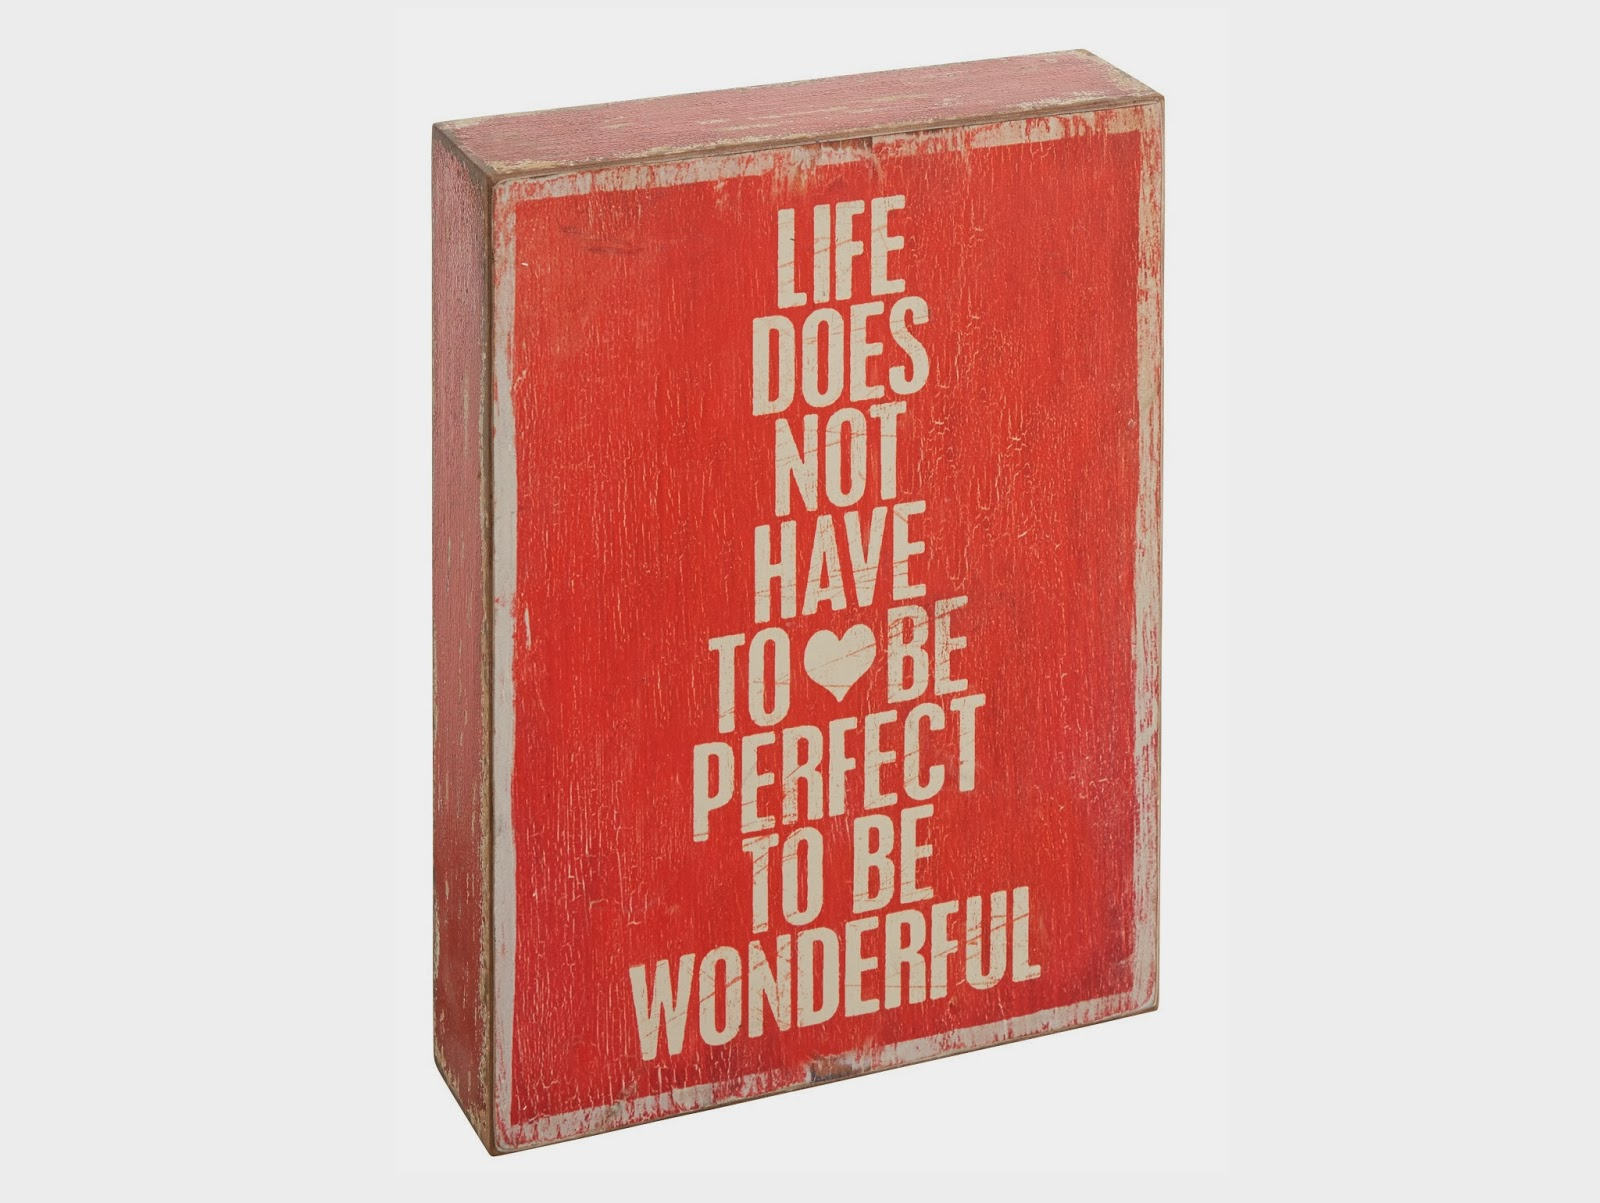 http://www.portobellostreet.es/mueble/33644/Cuadro-de-decoracion-de-madera-Wonderful